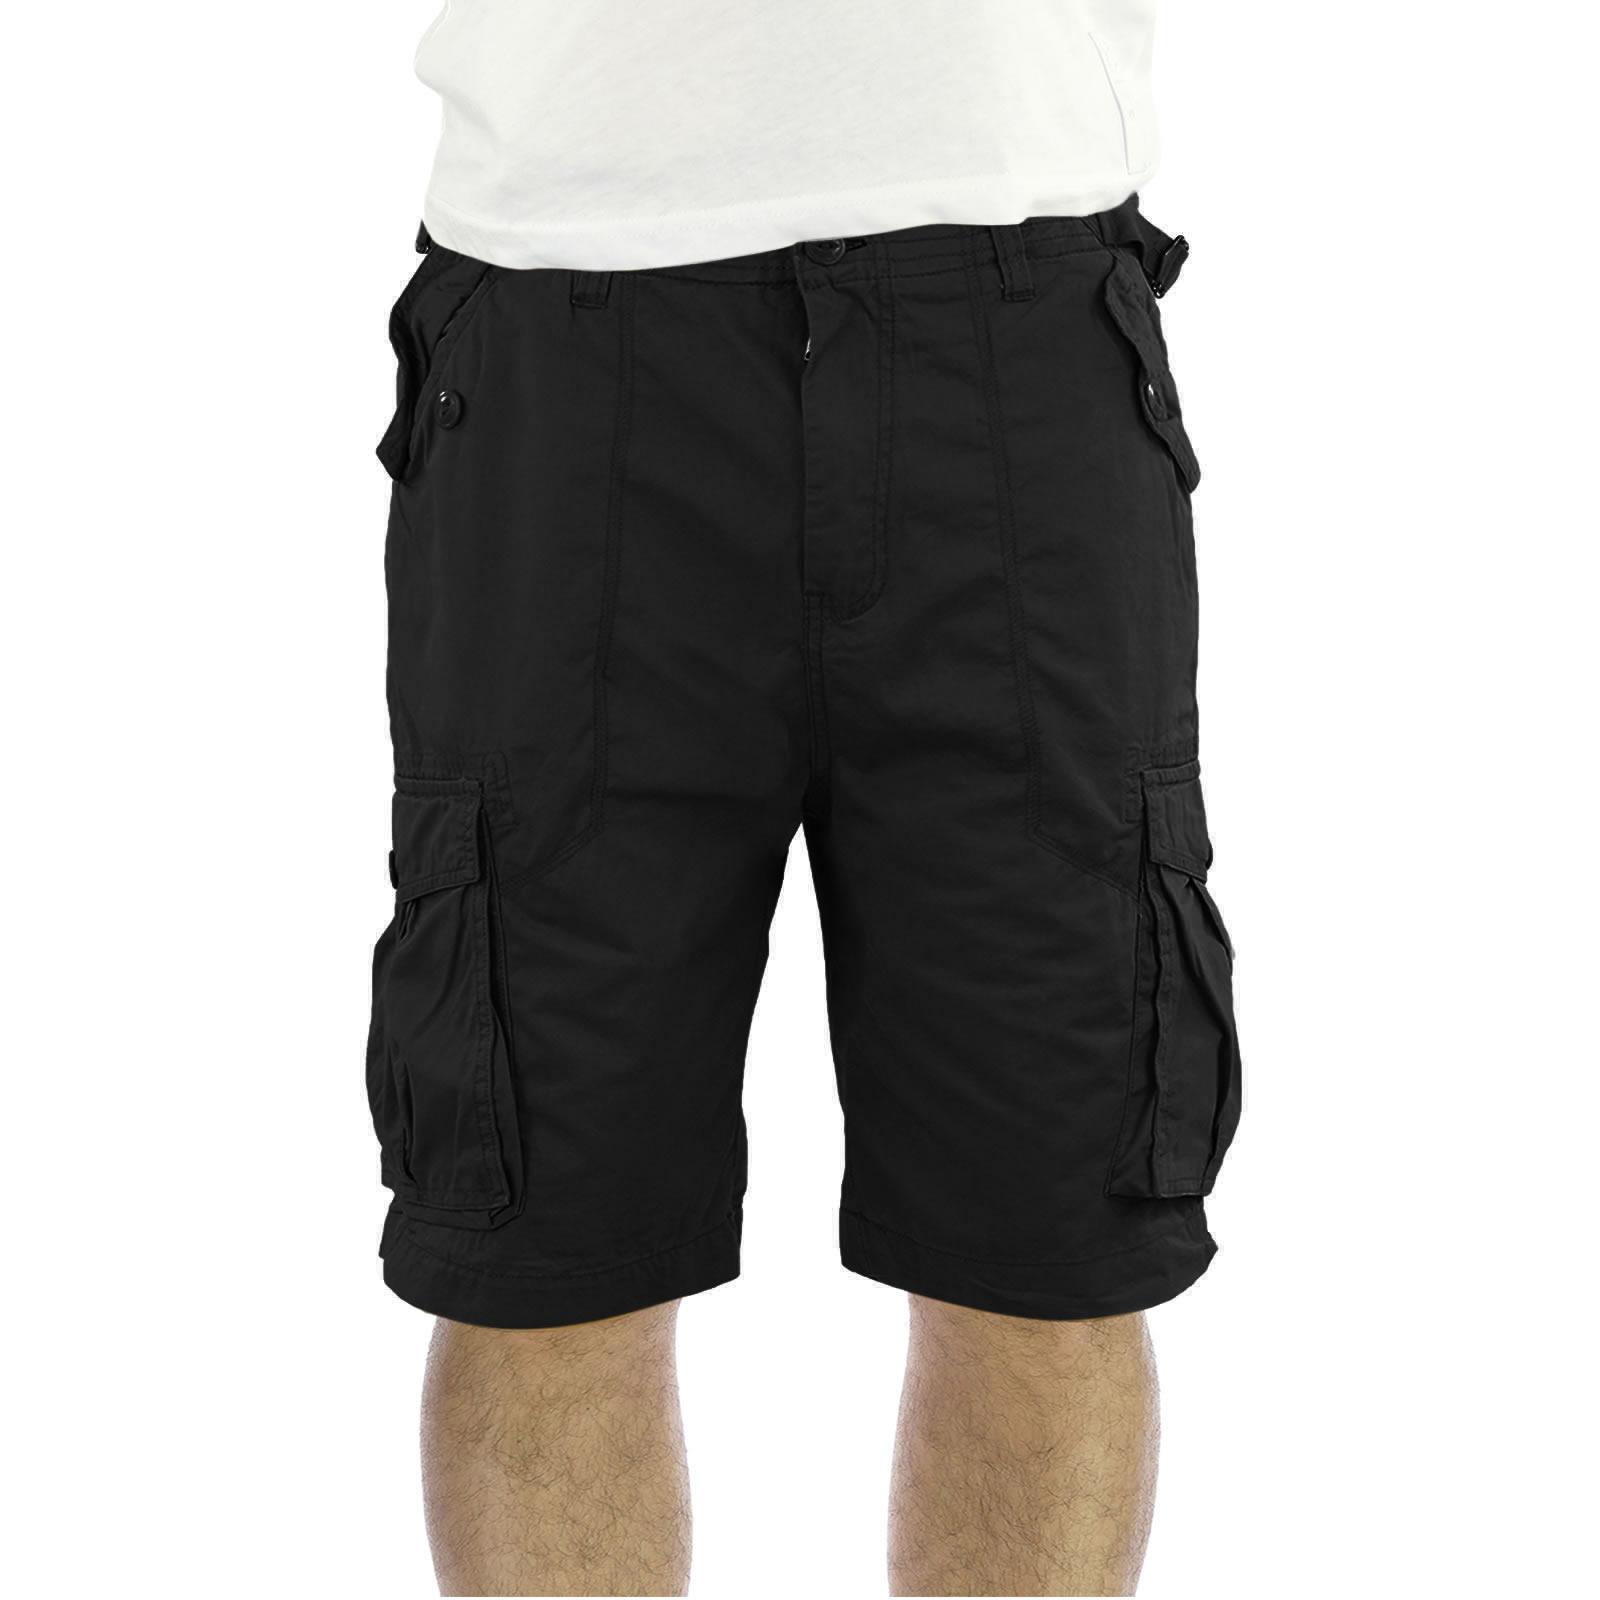 Mens Cargo Shorts Firetrap Nolin Military Cotton Knee Length ...